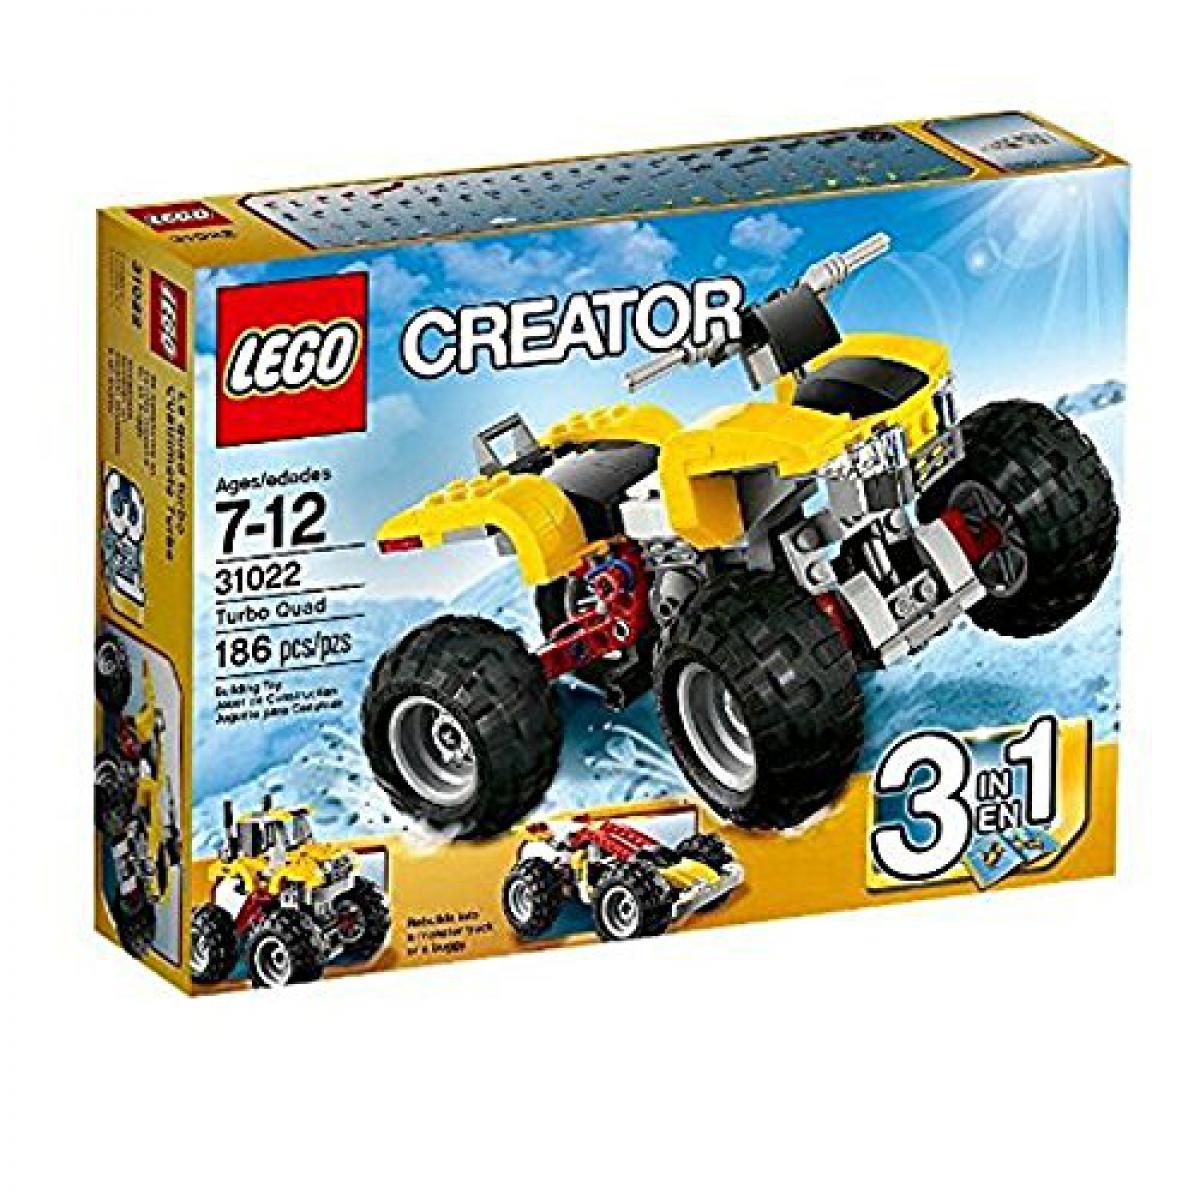 Lego LEgO Creator Set 31022 Turbo Quad